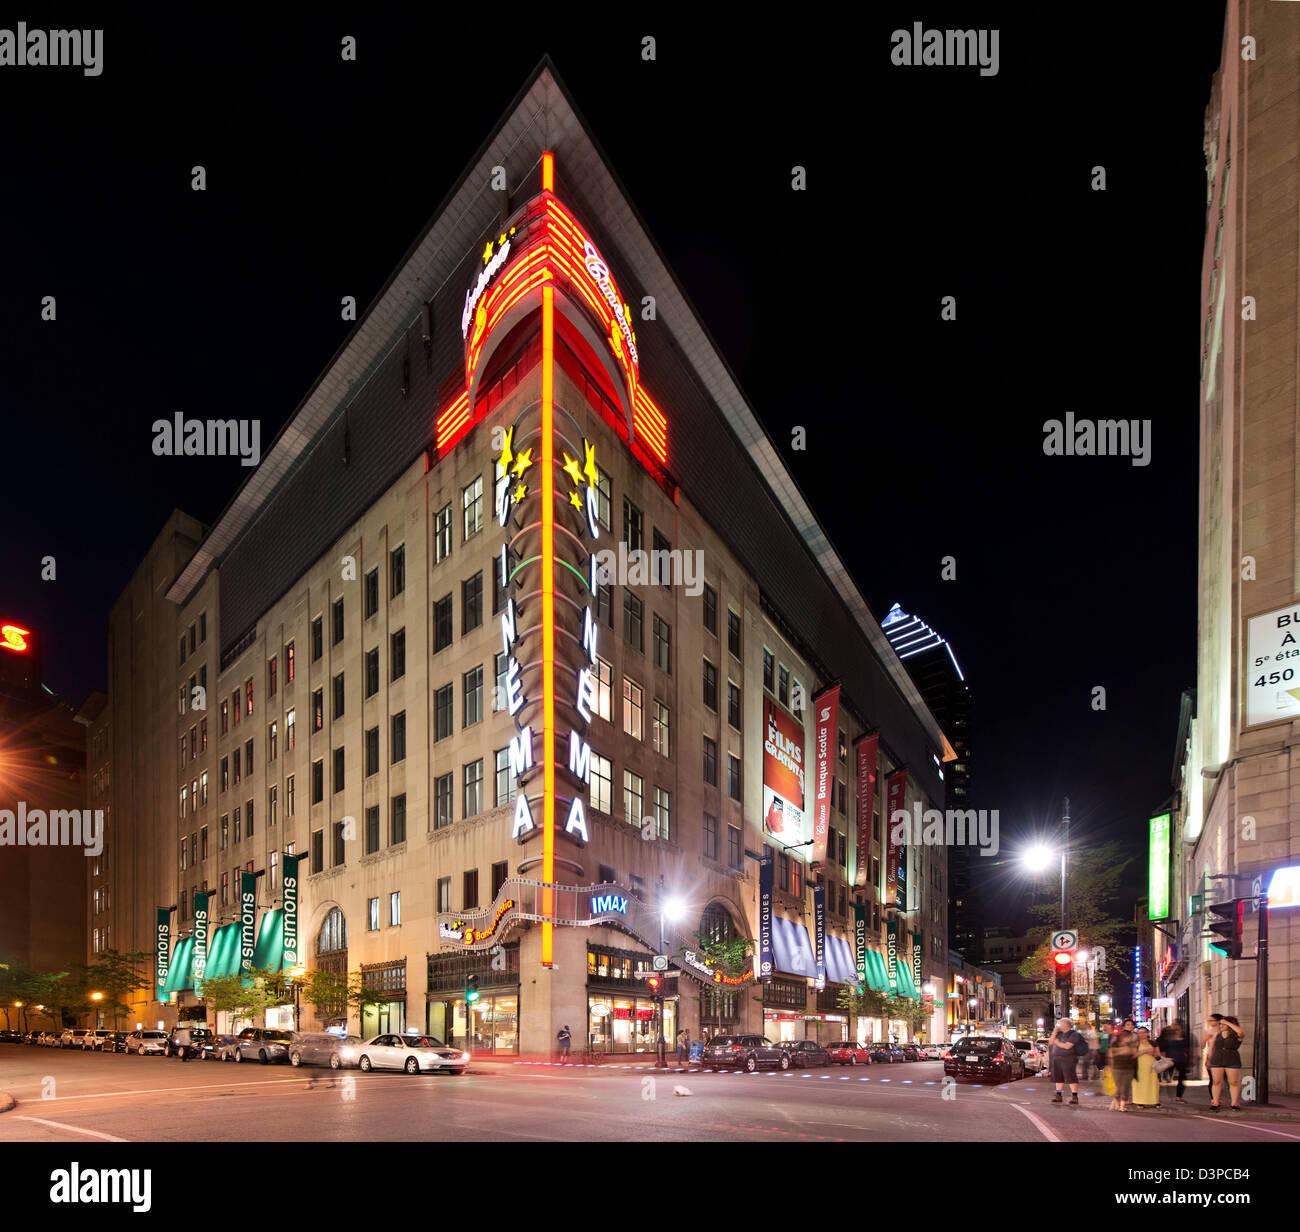 Scotia Bank Kino Kino, rue Sainte Catherine, downtown Montreal, Quebec, Kanada Stockbild